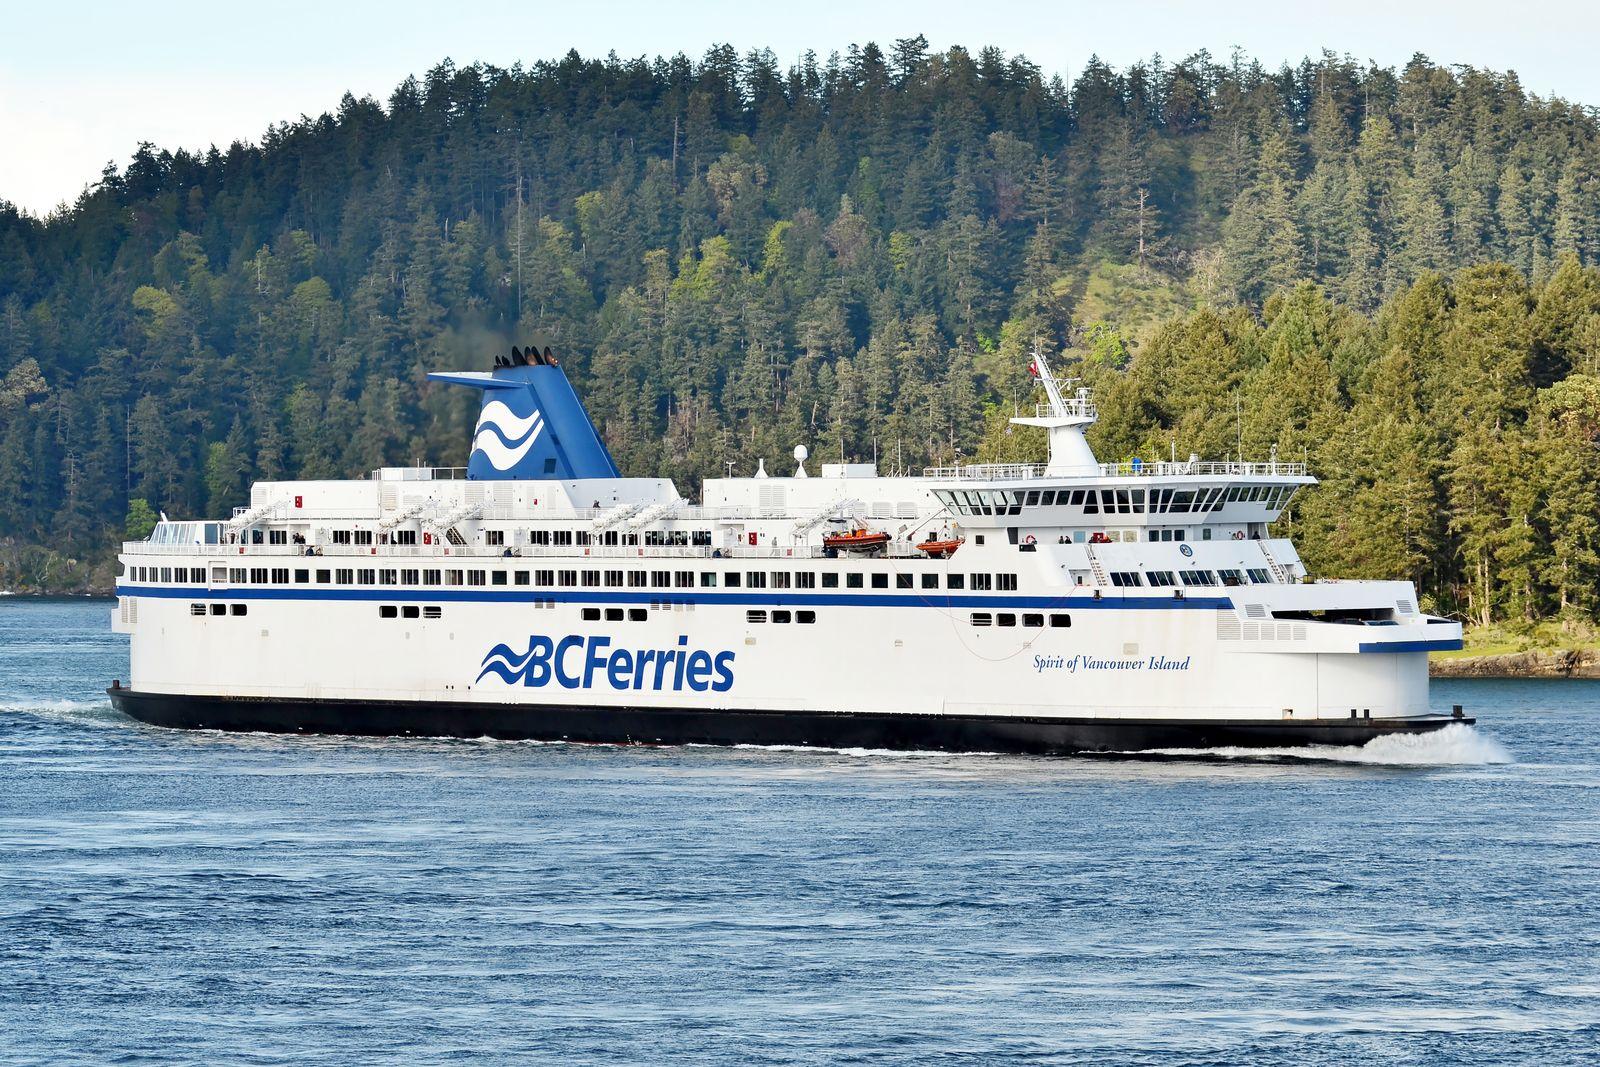 Spirit of Vancouver Island der BC Ferries